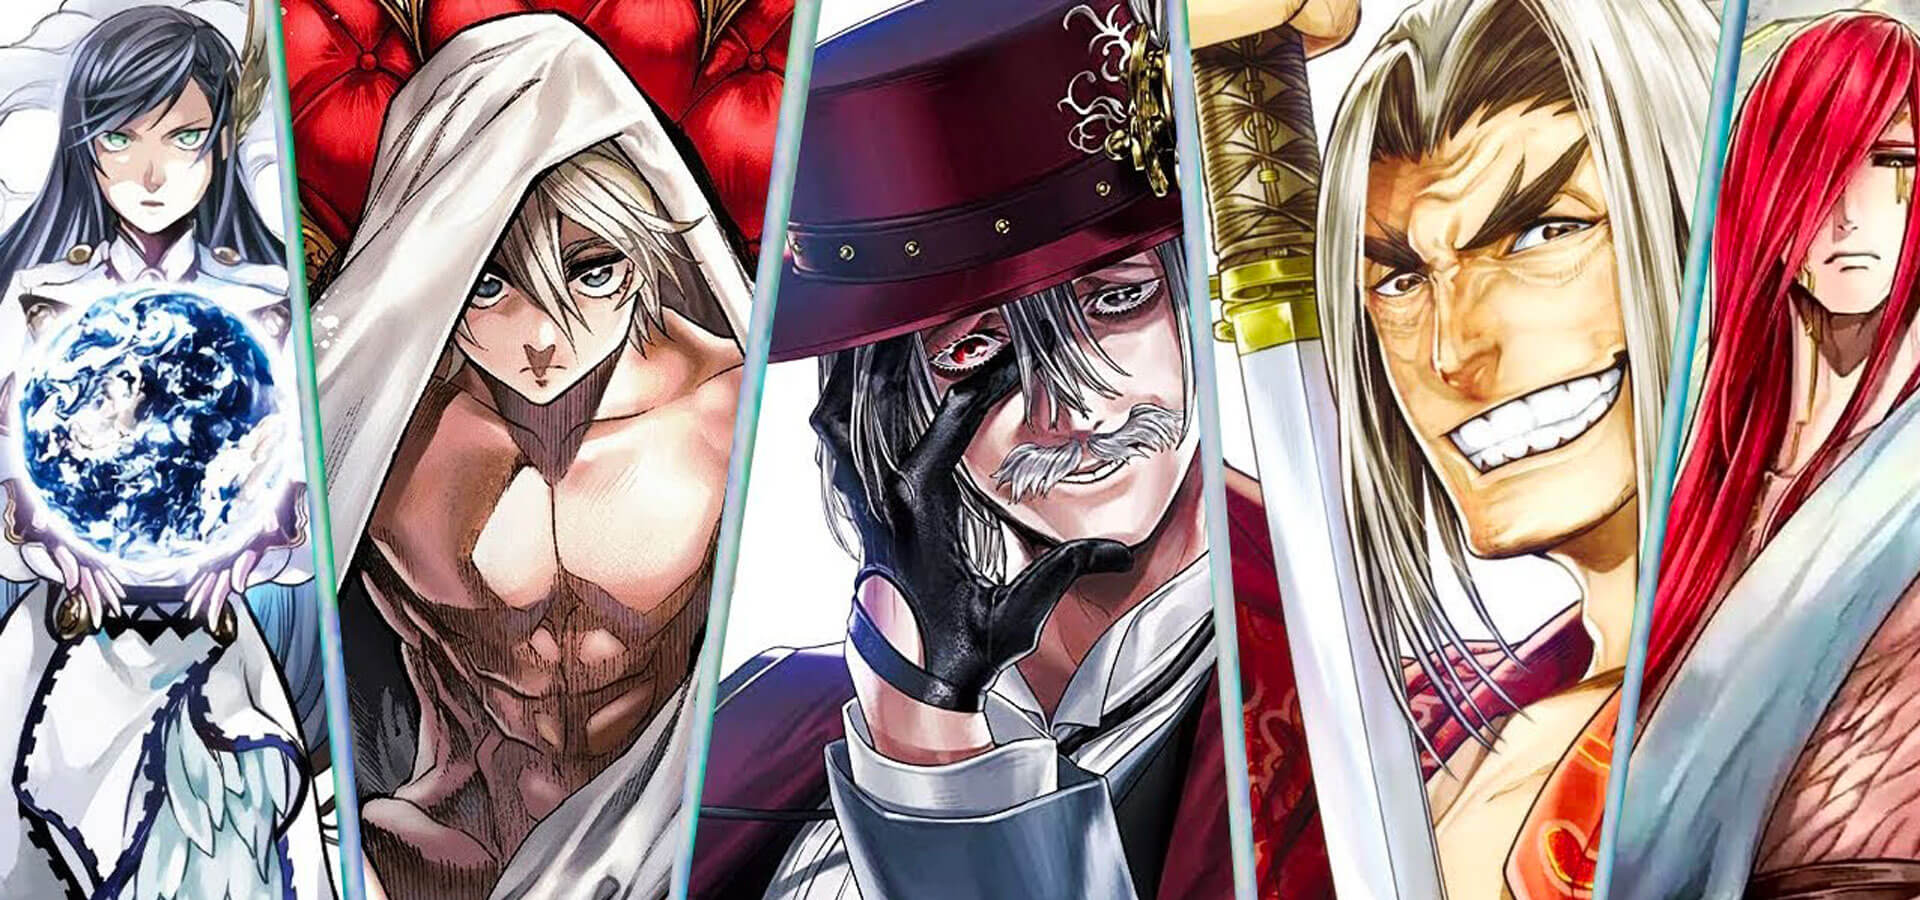 Teaser de l'anime Shuumatsu no Valkyrie: Record of Ragnarok